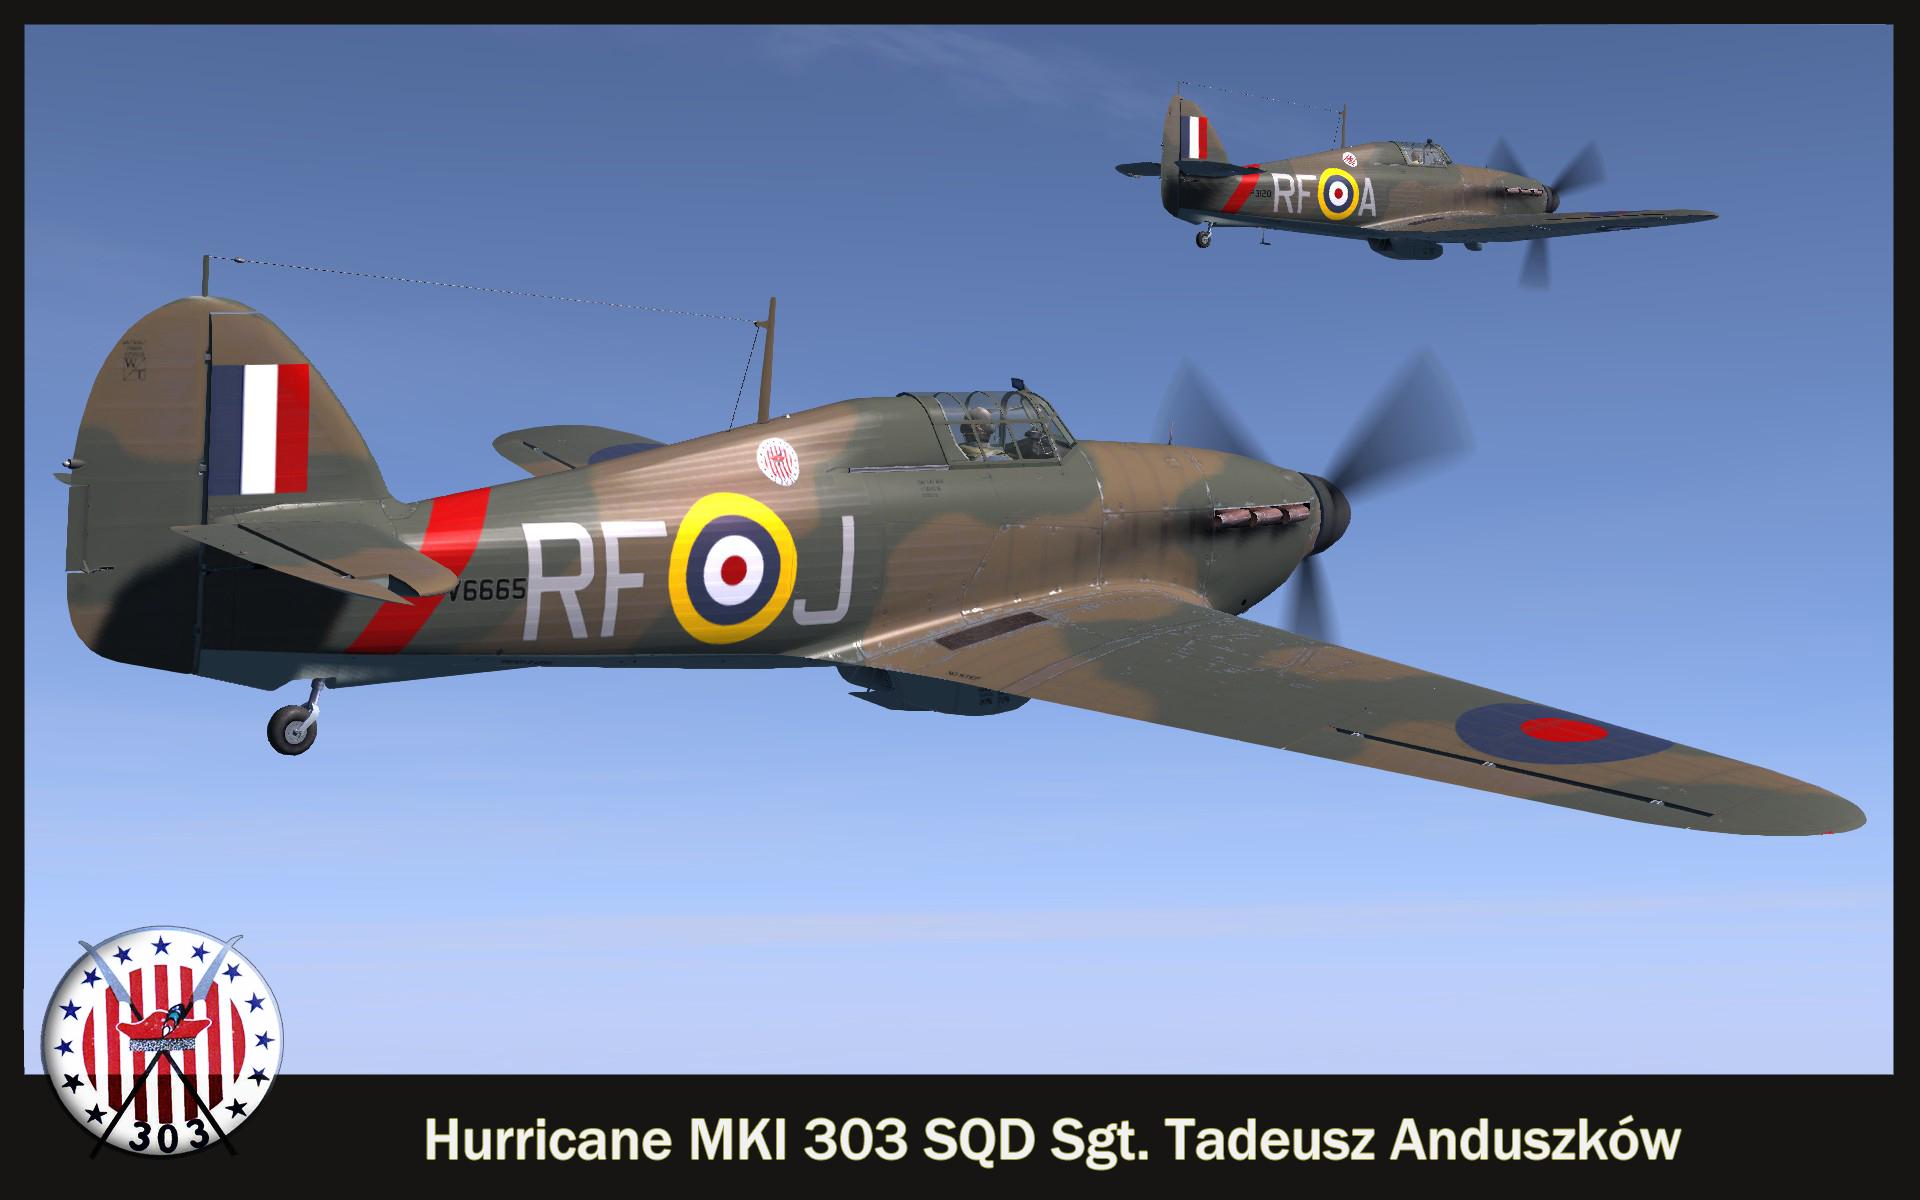 COD SO Hurricane I RAF 303Sqn RFJ Tadeusz Anduszkow V6665 England 1940 V0A